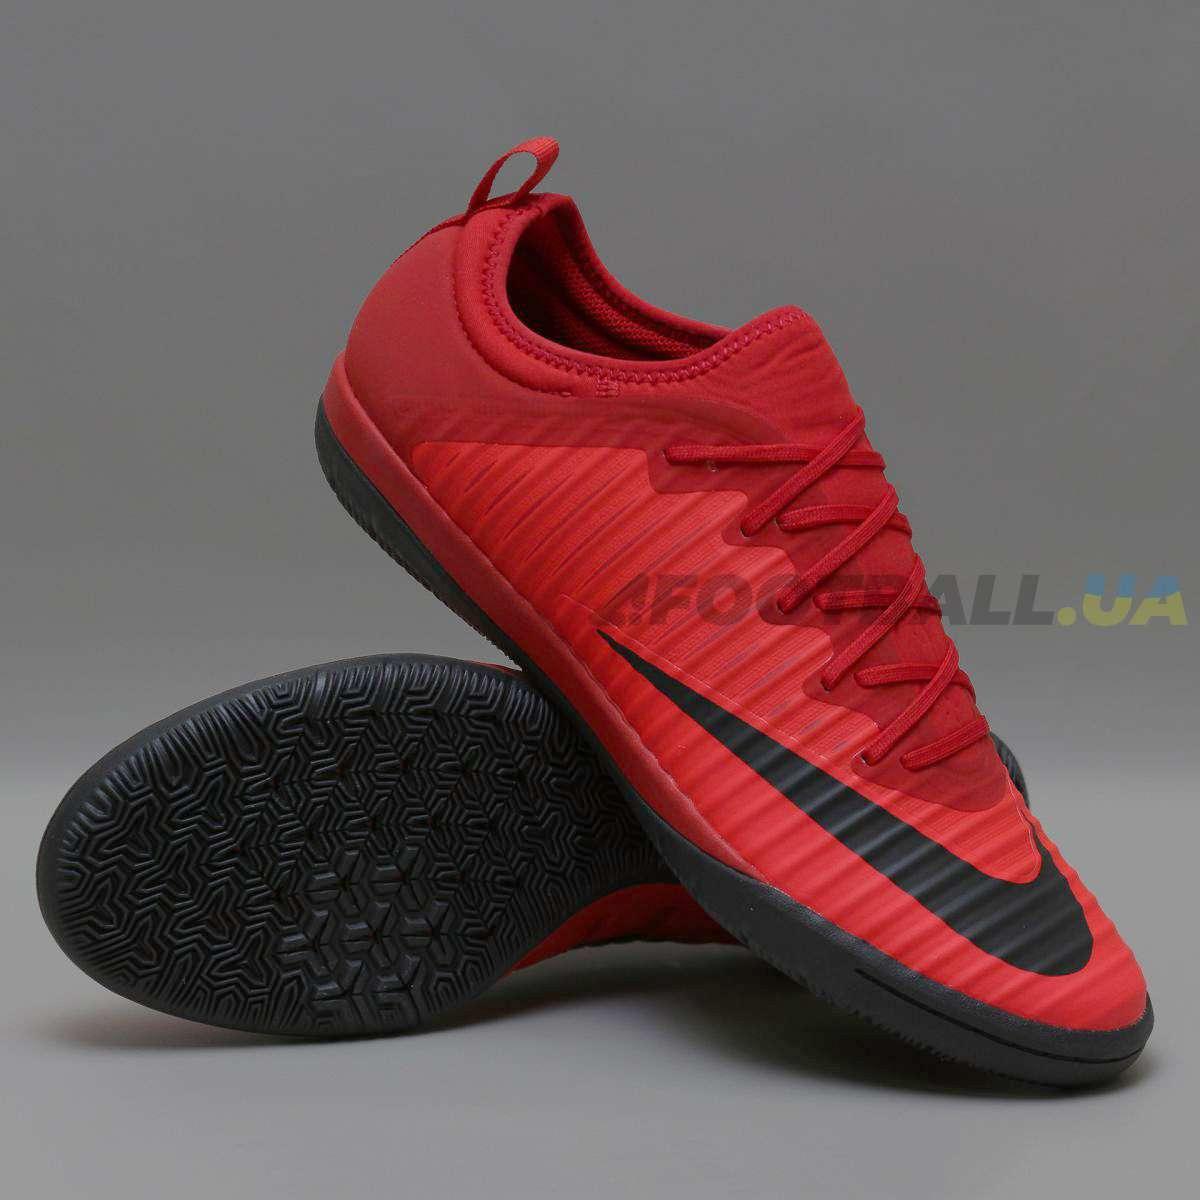 5bca49682abc46 Футзалки Nike MercurialX Finale II IC 831974-616 RED купить на ...